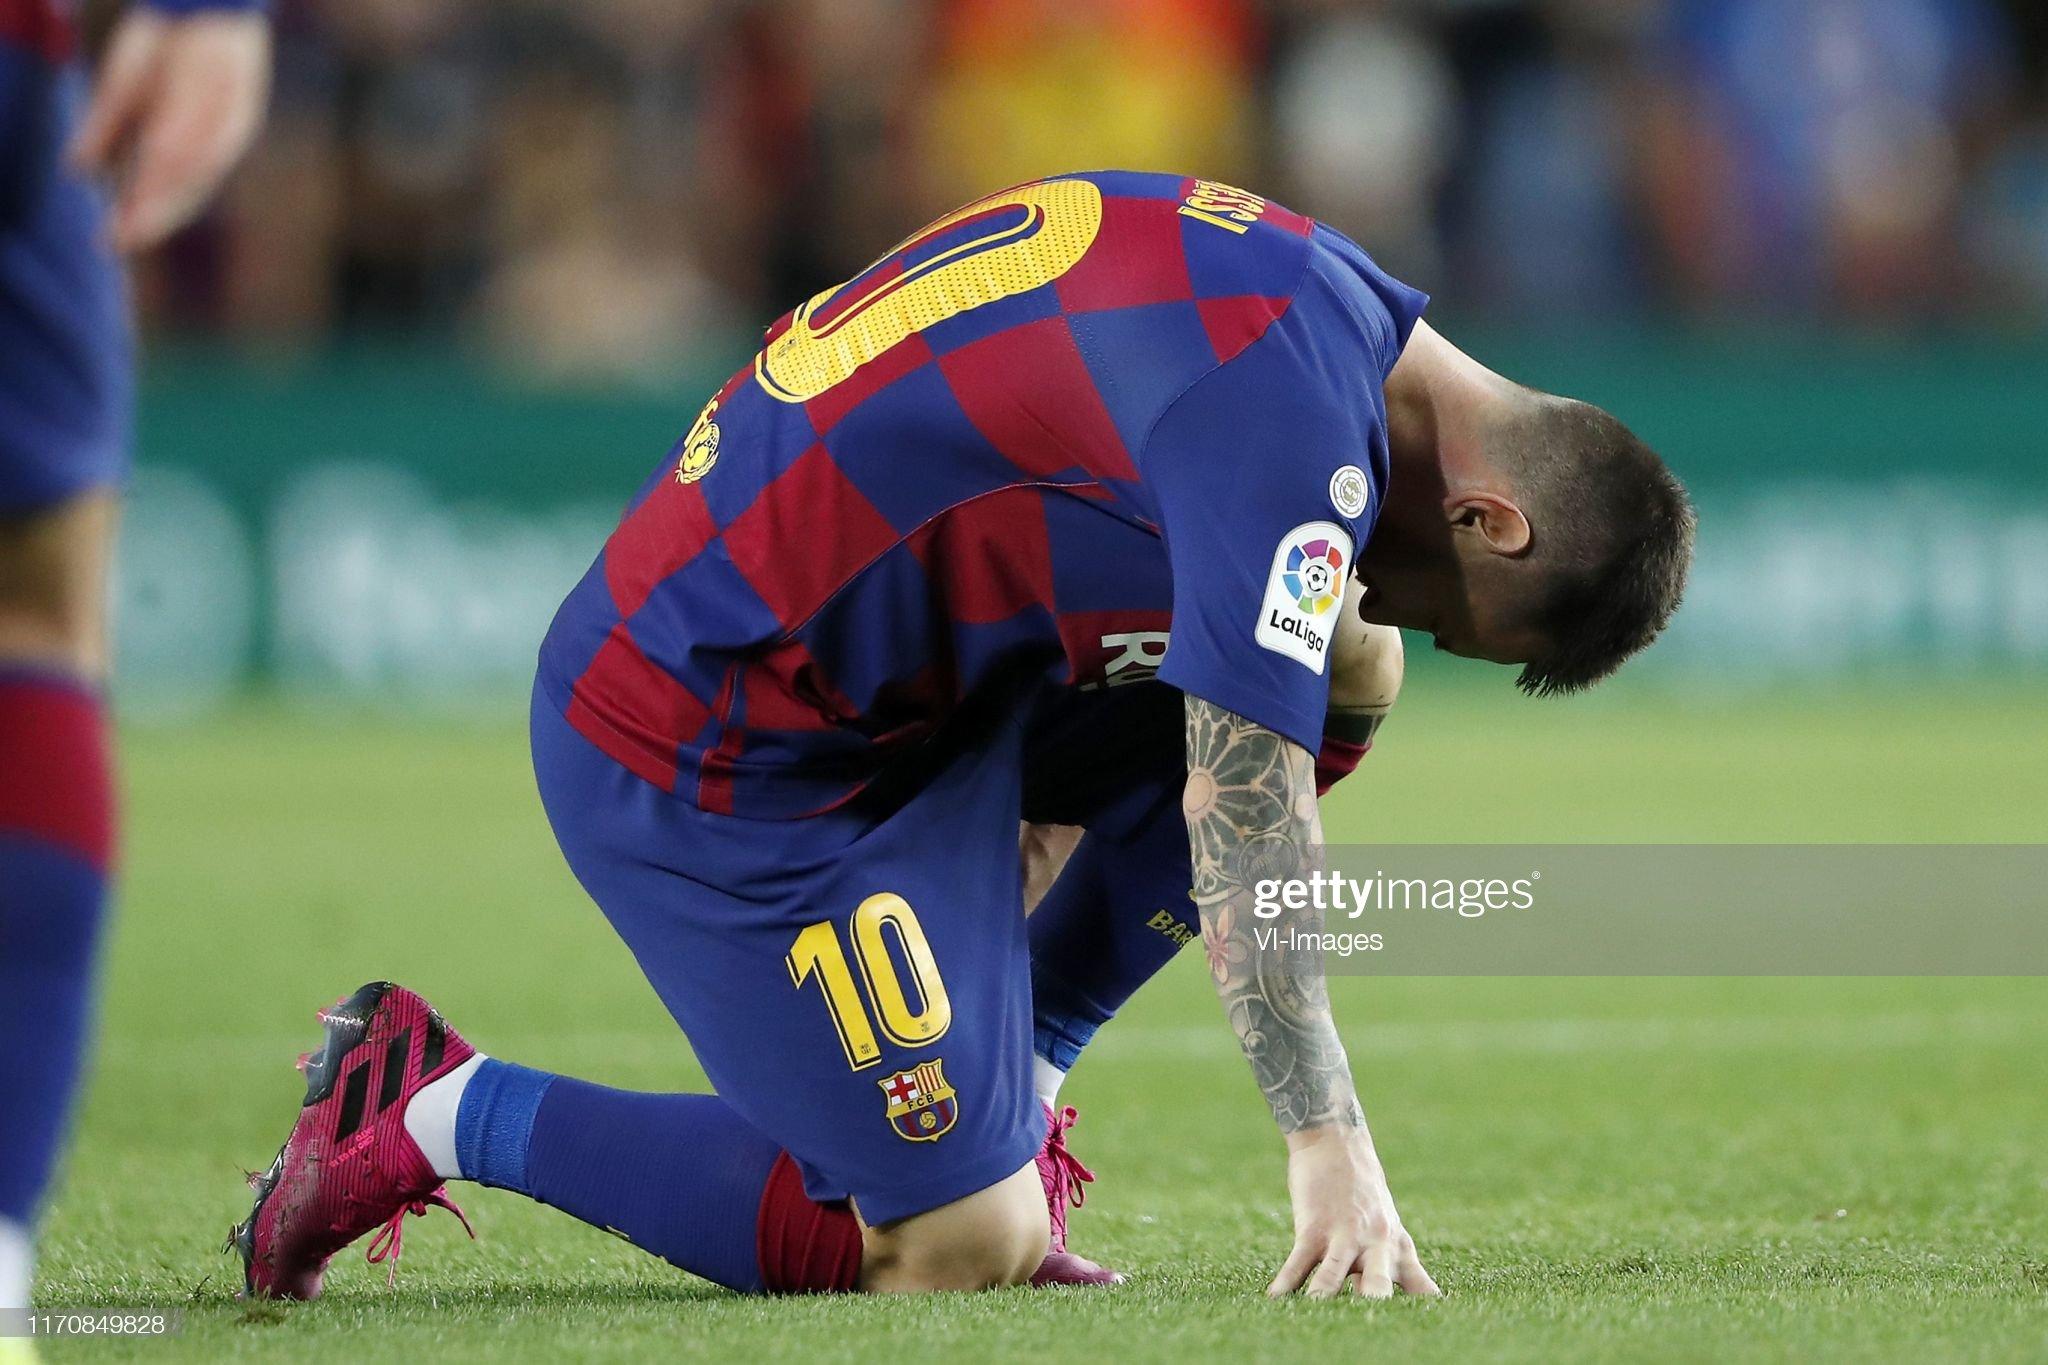 صور مباراة : برشلونة - فياريال 2-1 ( 24-09-2019 )  Lionel-messi-of-fc-barcelona-during-the-laliga-santander-match-fc-picture-id1170849828?s=2048x2048